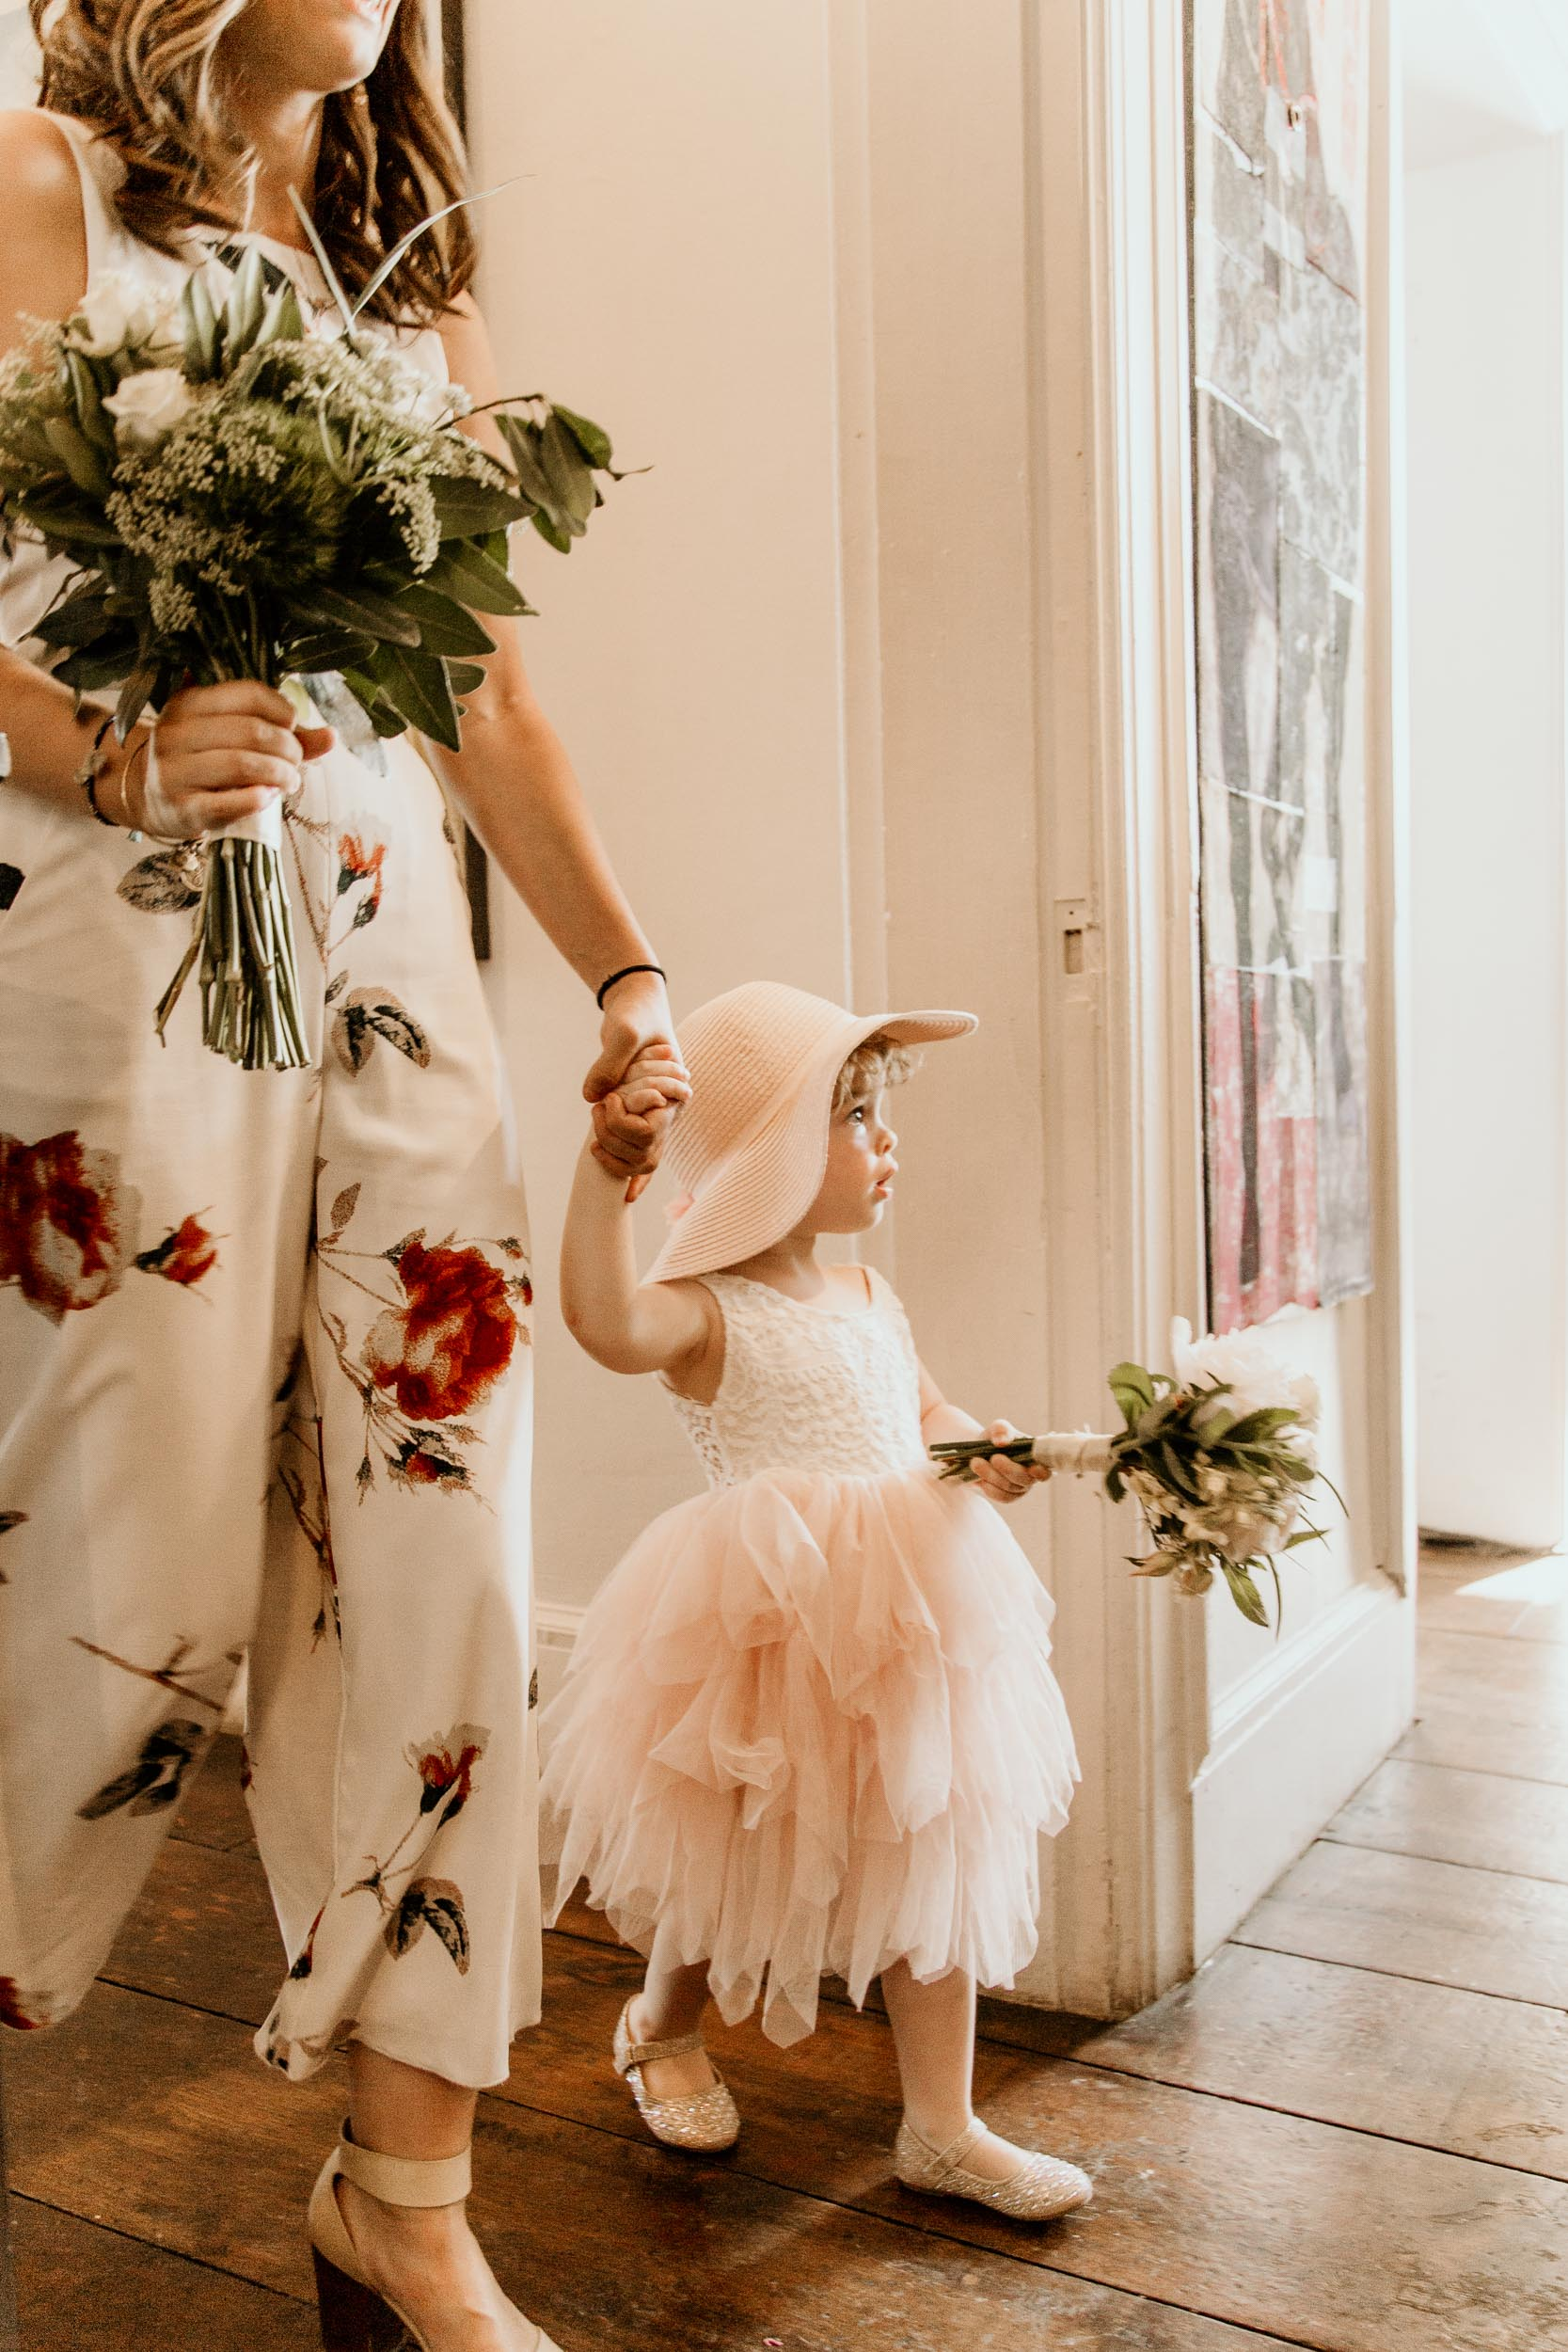 elopement-engagement-photographer-ottawa-4293.jpg